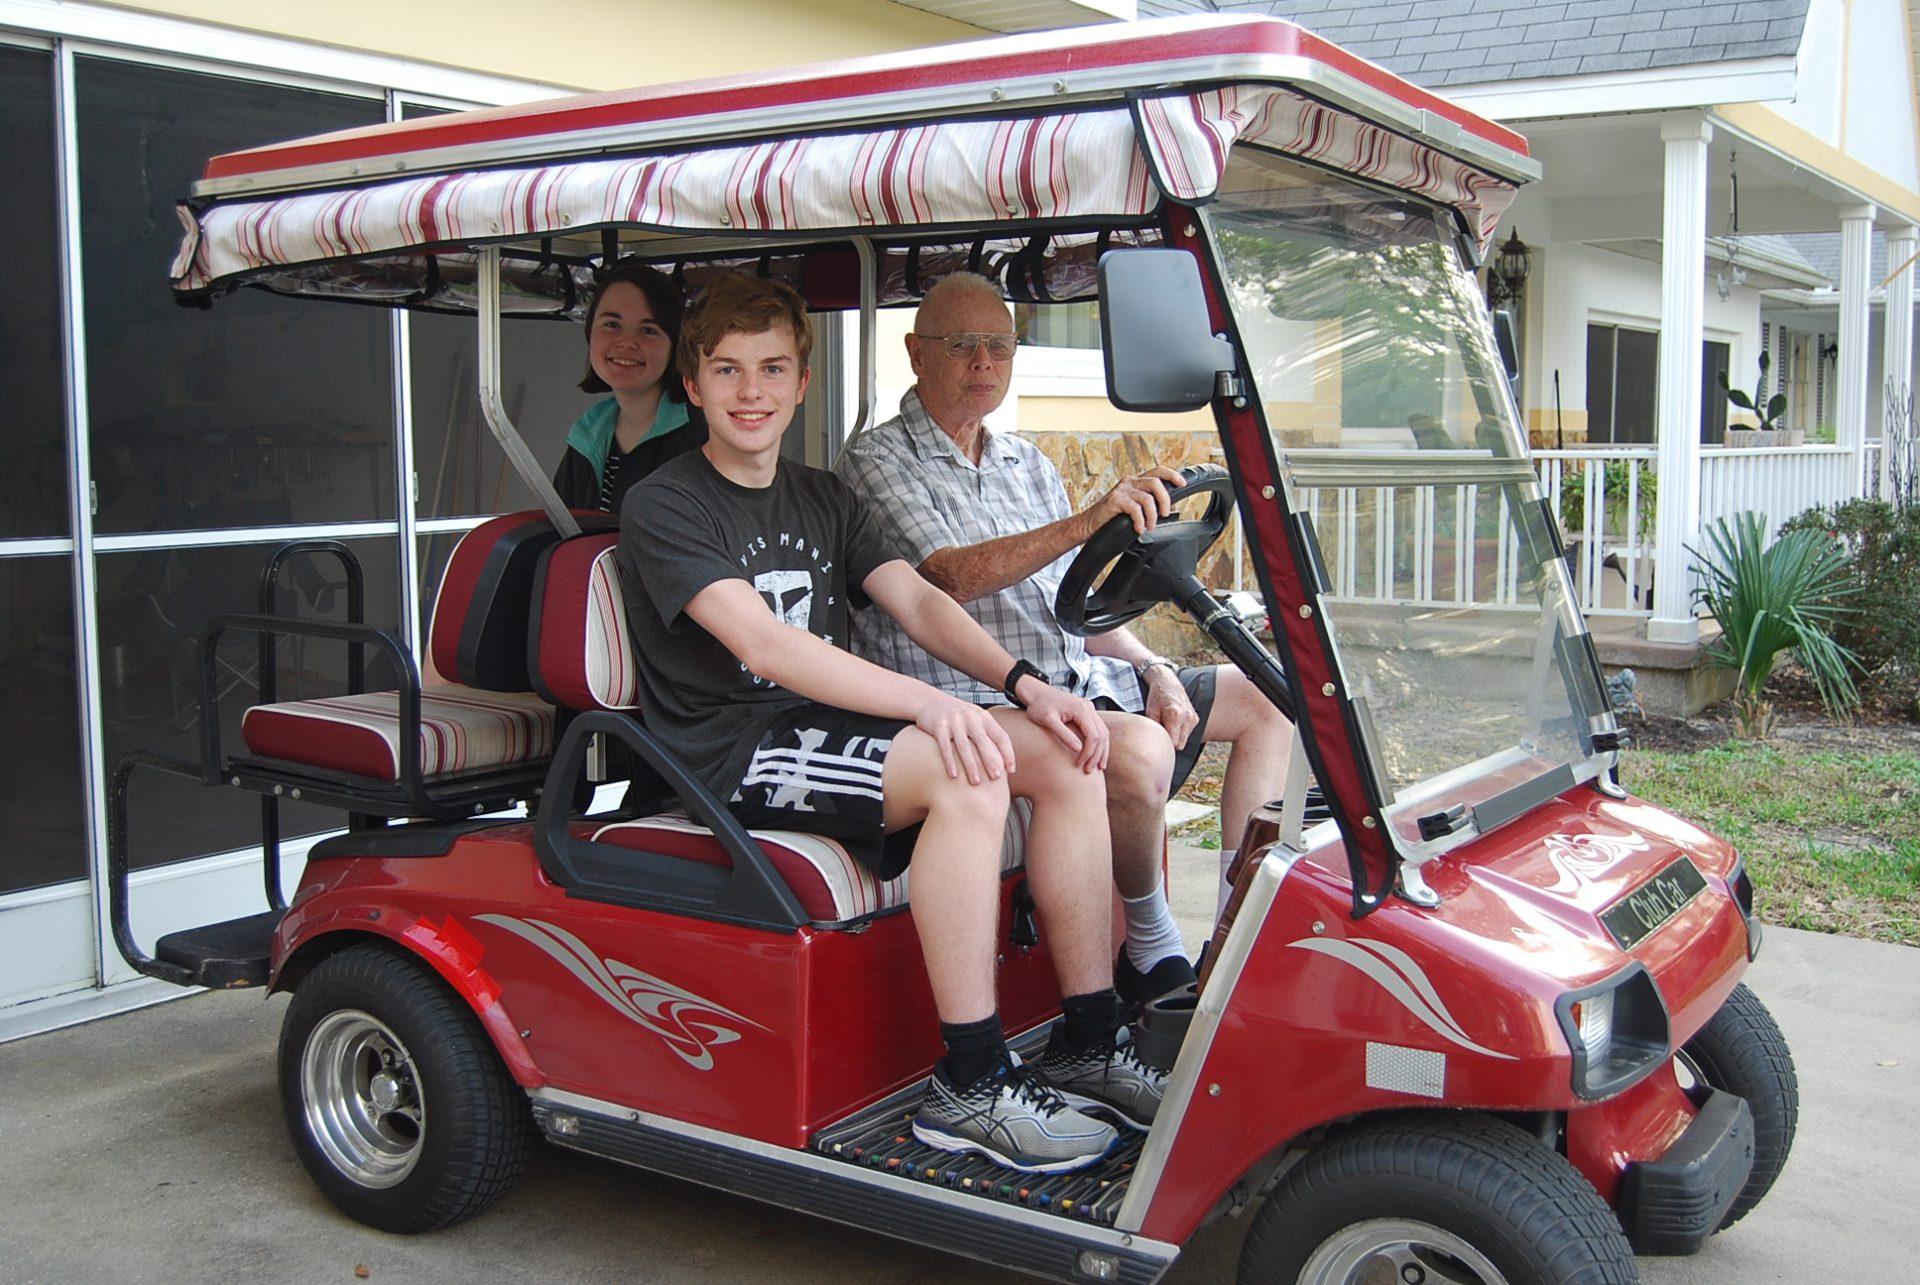 Having fun on Grandpa's golf cart